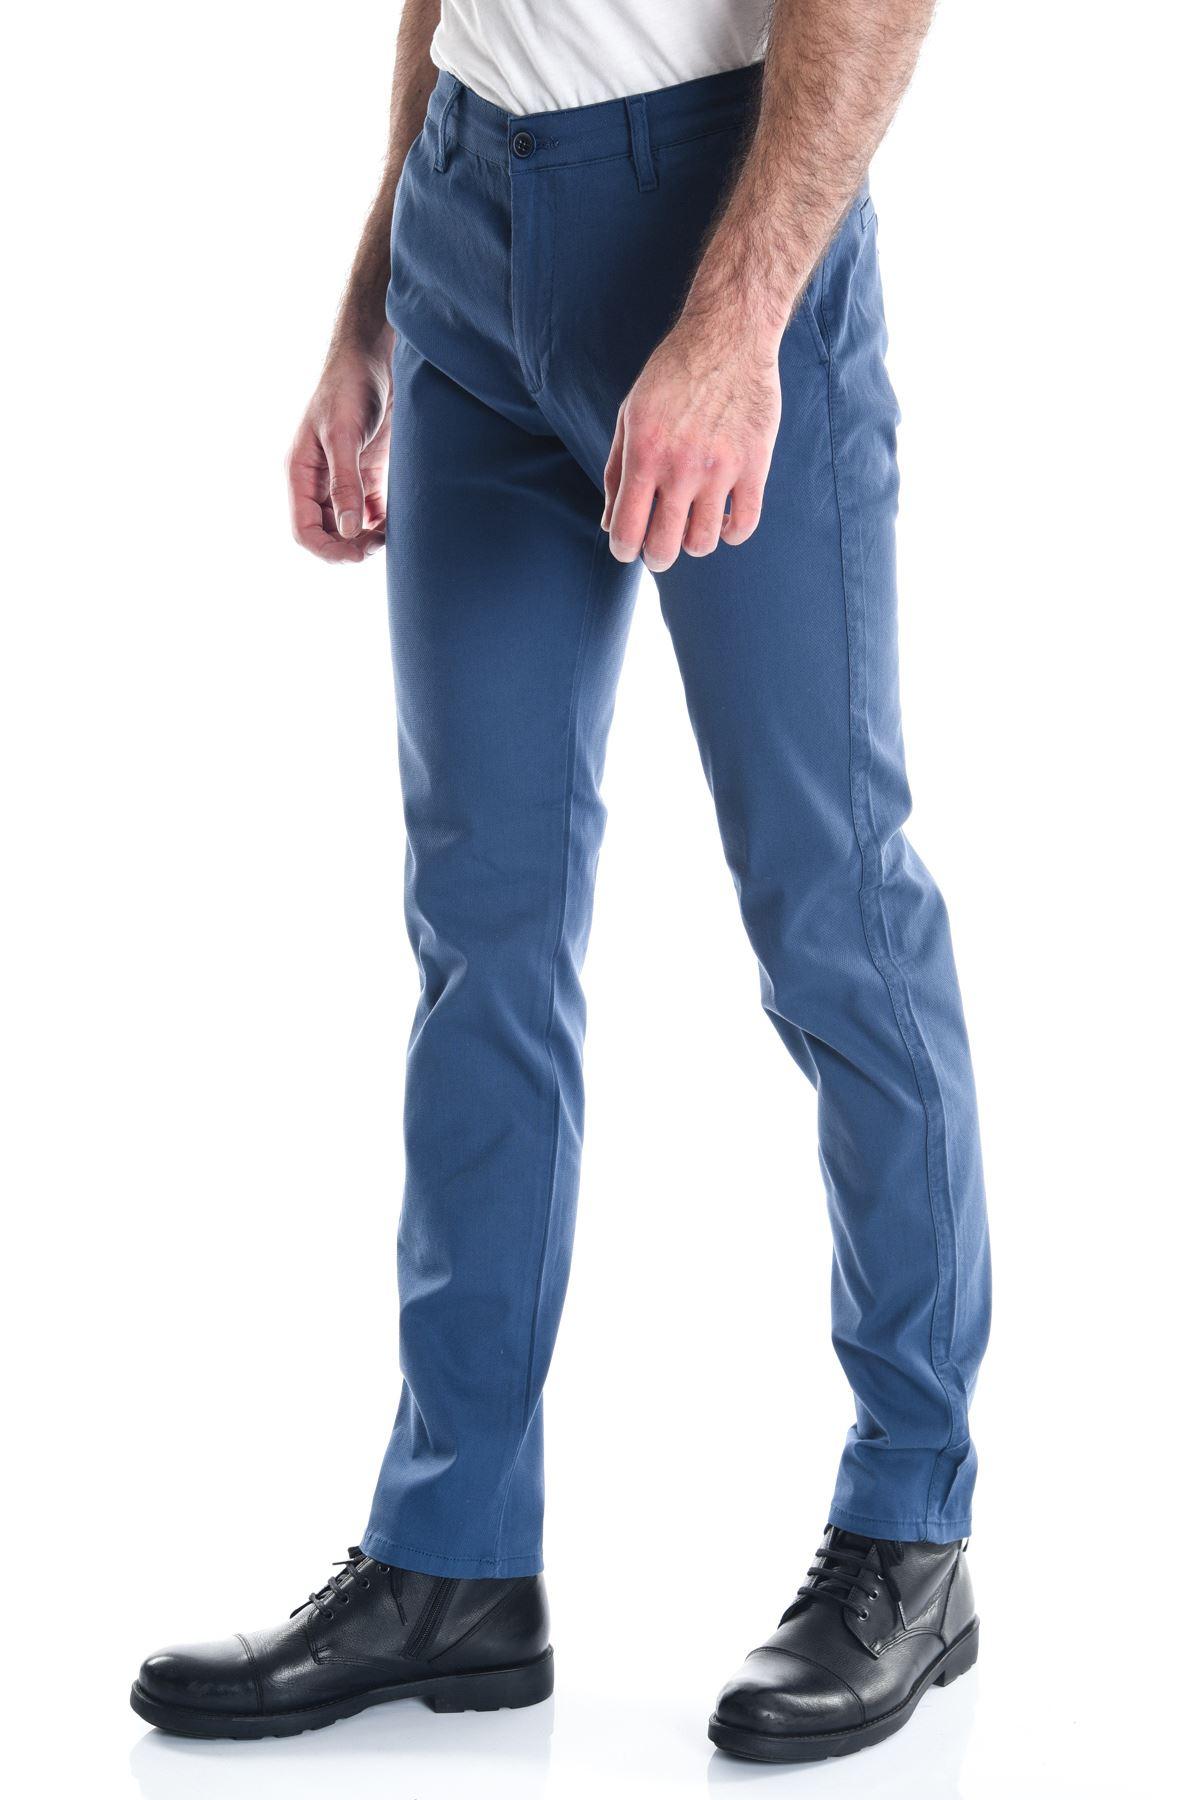 İndigo Slimfit Desenli Erkek Pantolon